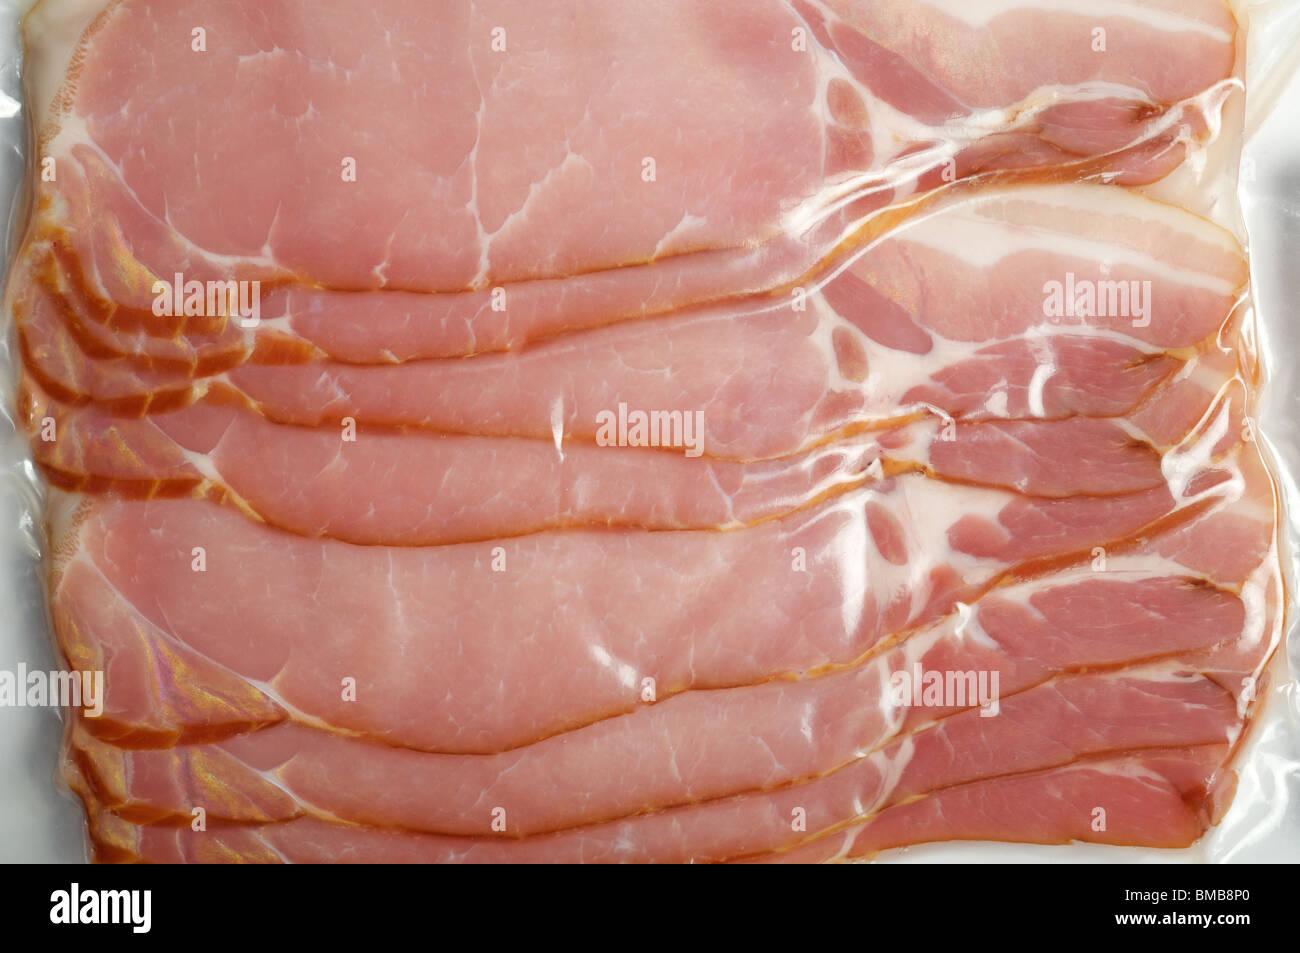 Pinney's of Orford Debenham bacon - Stock Image